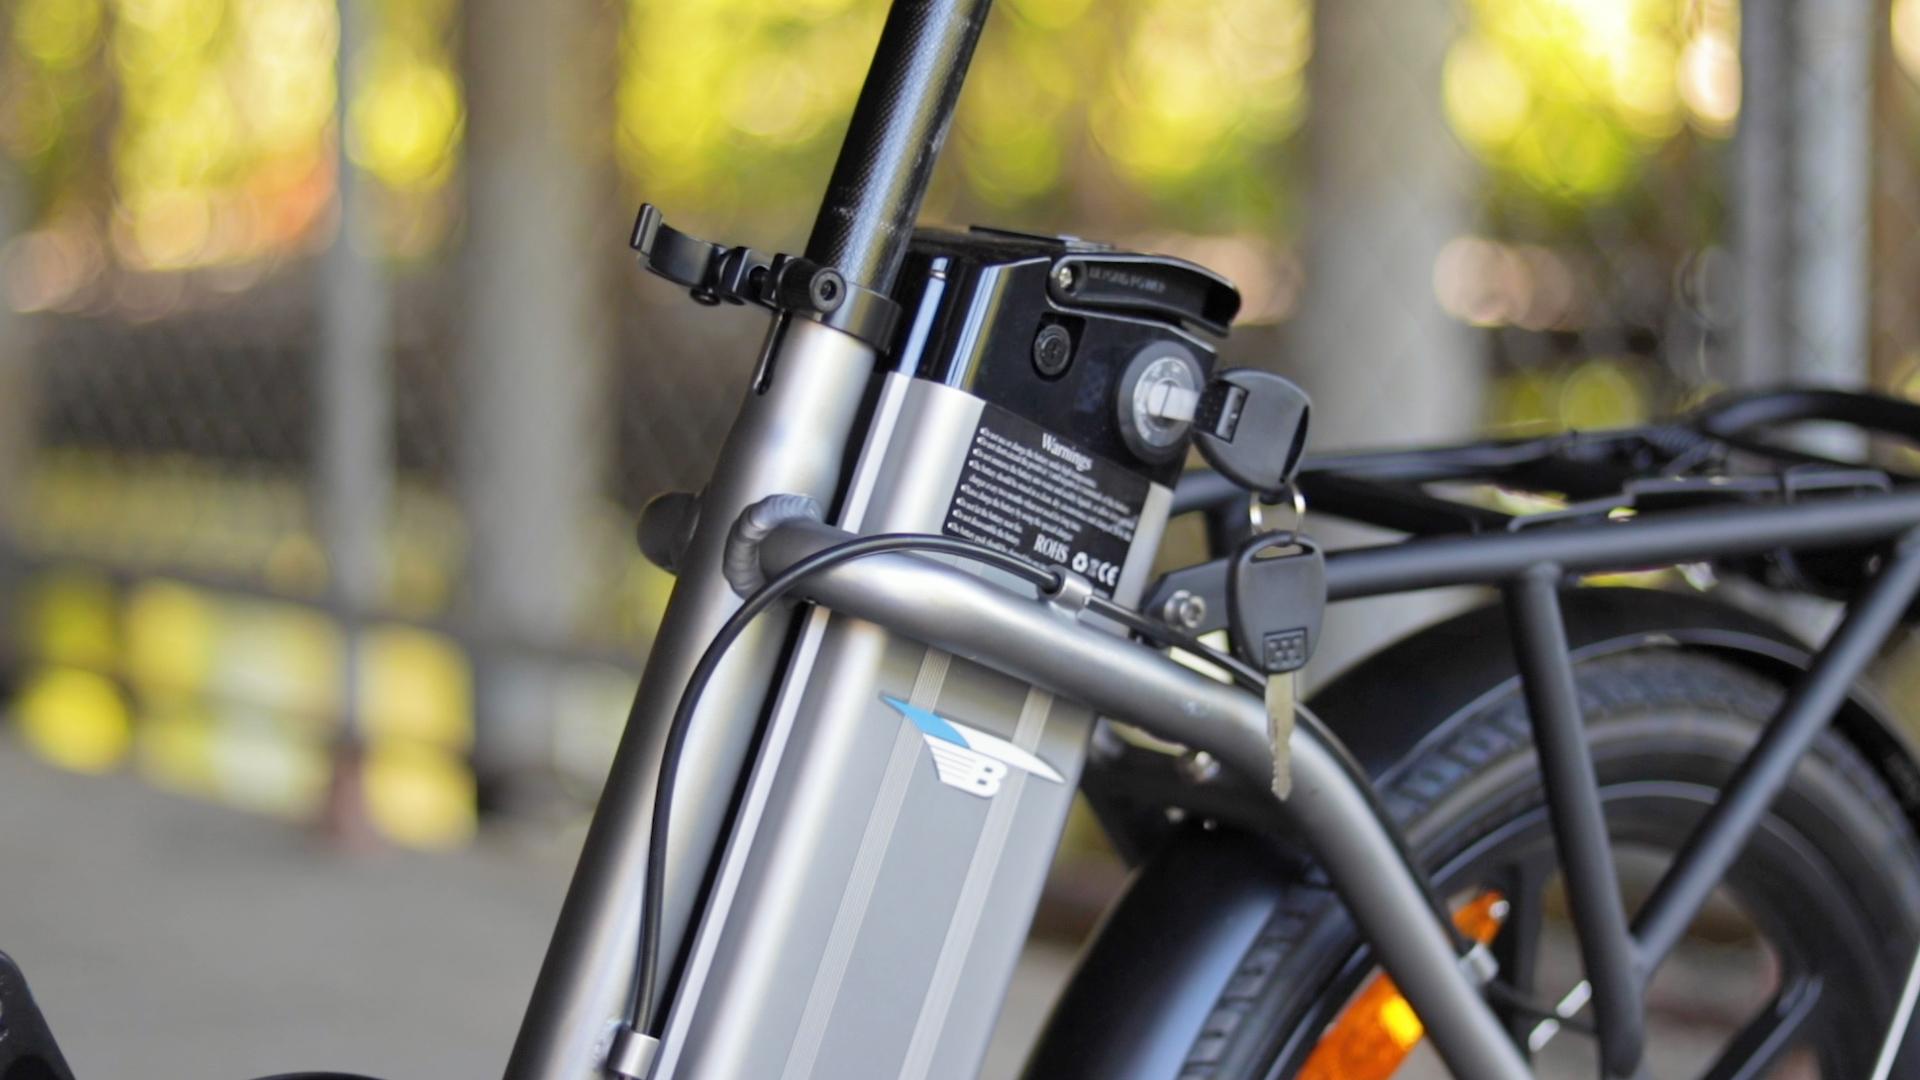 electrified-reviews-bagibike-b10-foldign-electric-bike-review-battery-2.jpg